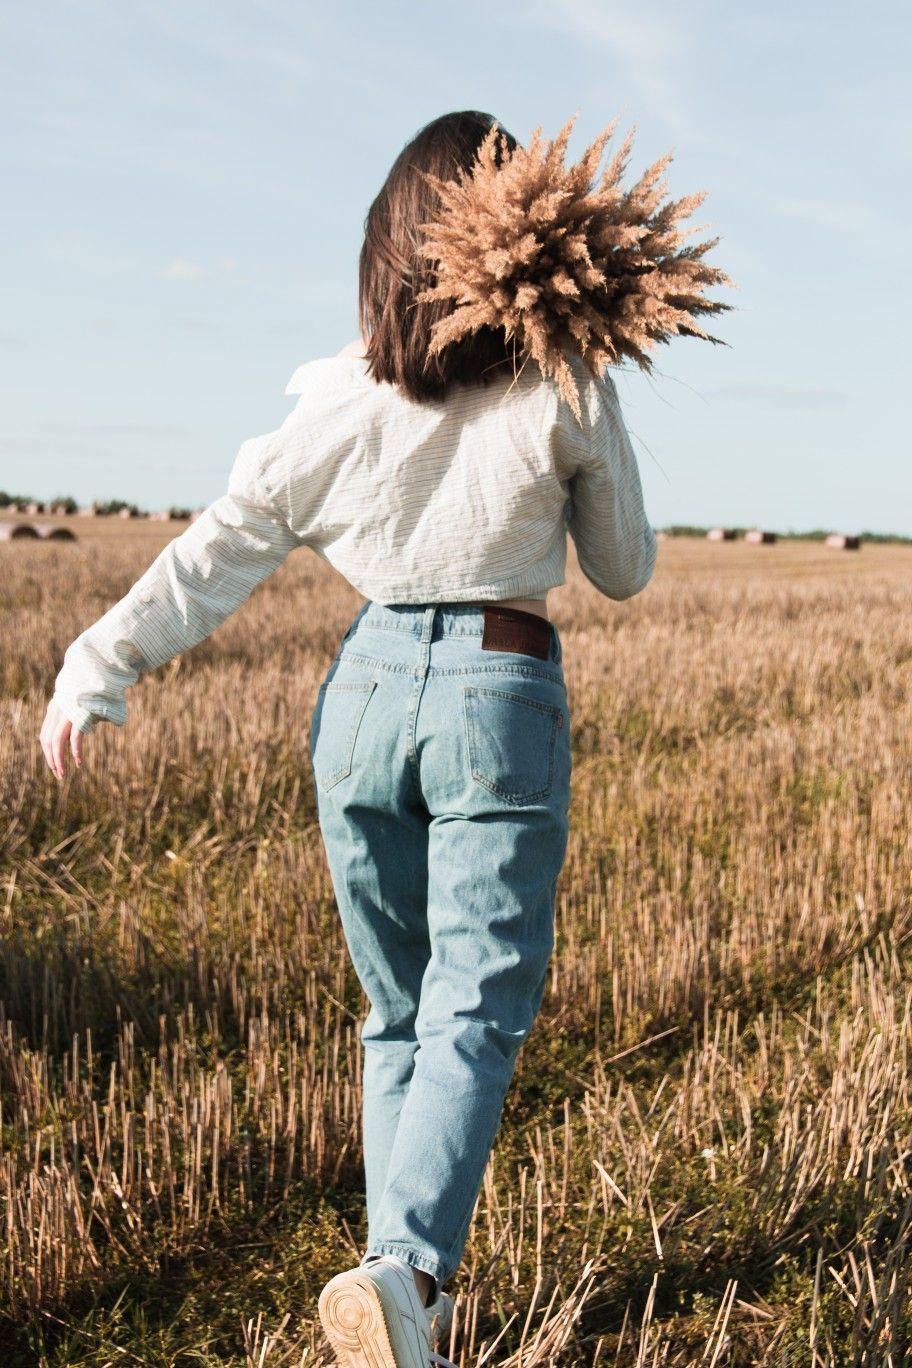 Фото в поле. Поле с пшеницей. Сено. фото с сеном. Стоги ...